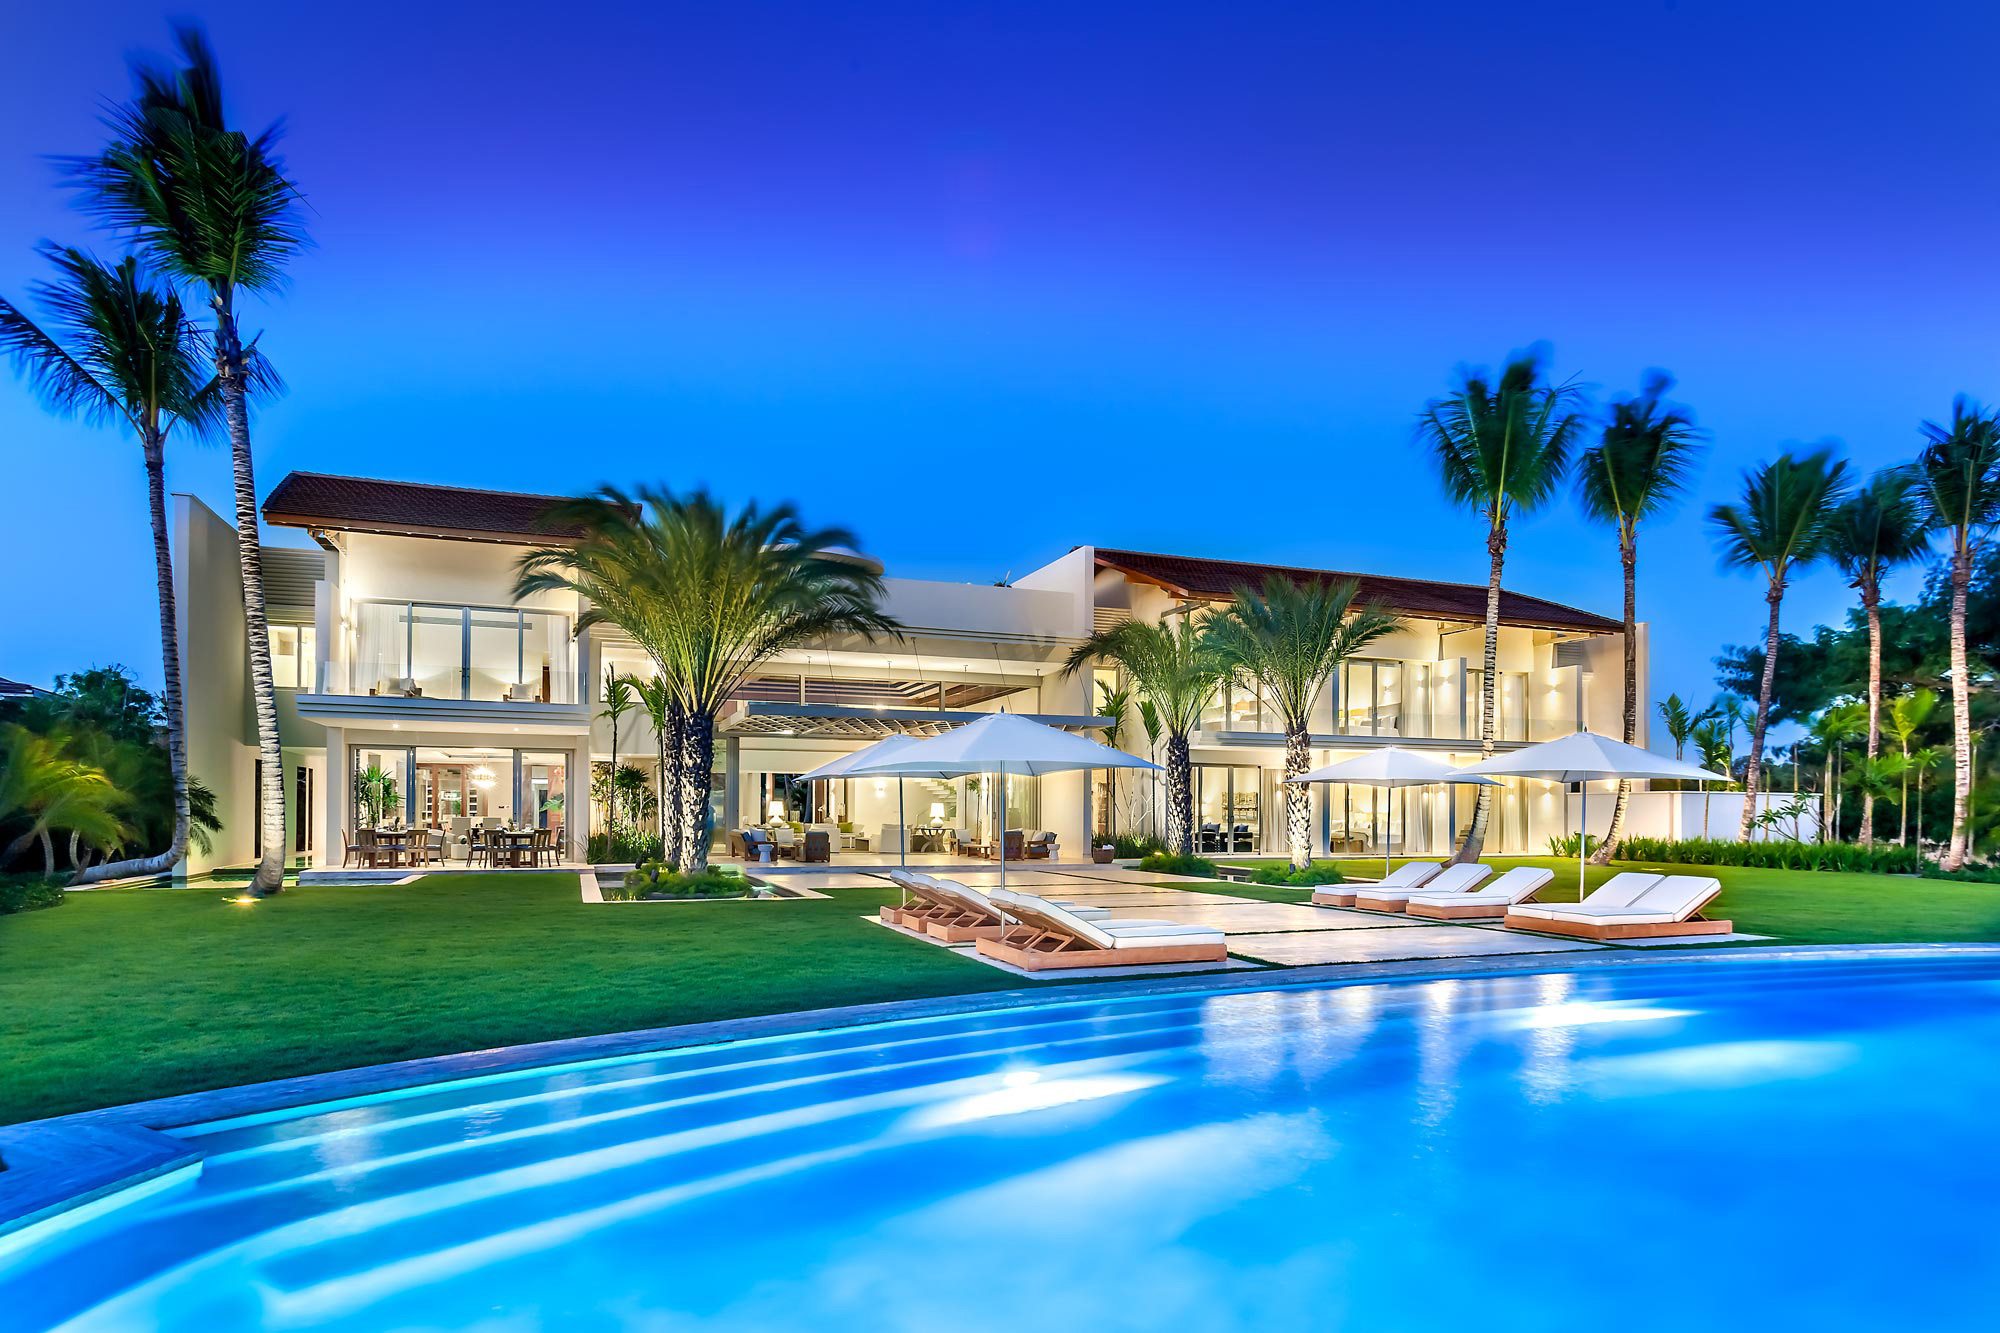 Luxury Caribbean Travel to Dominican Republic